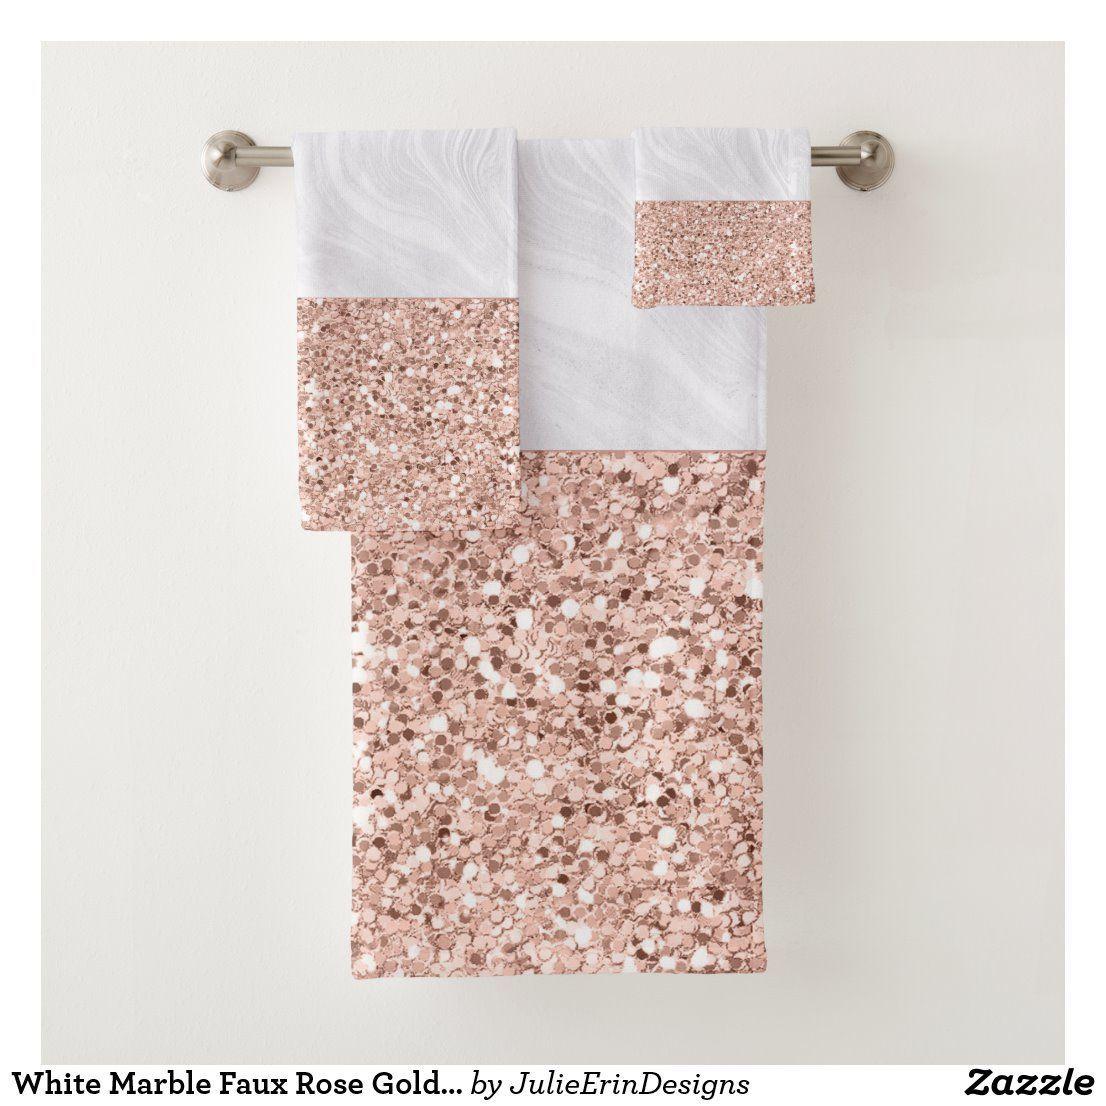 White Marble Faux Rose Gold Pink Glitter Bath Towel Set Zazzle